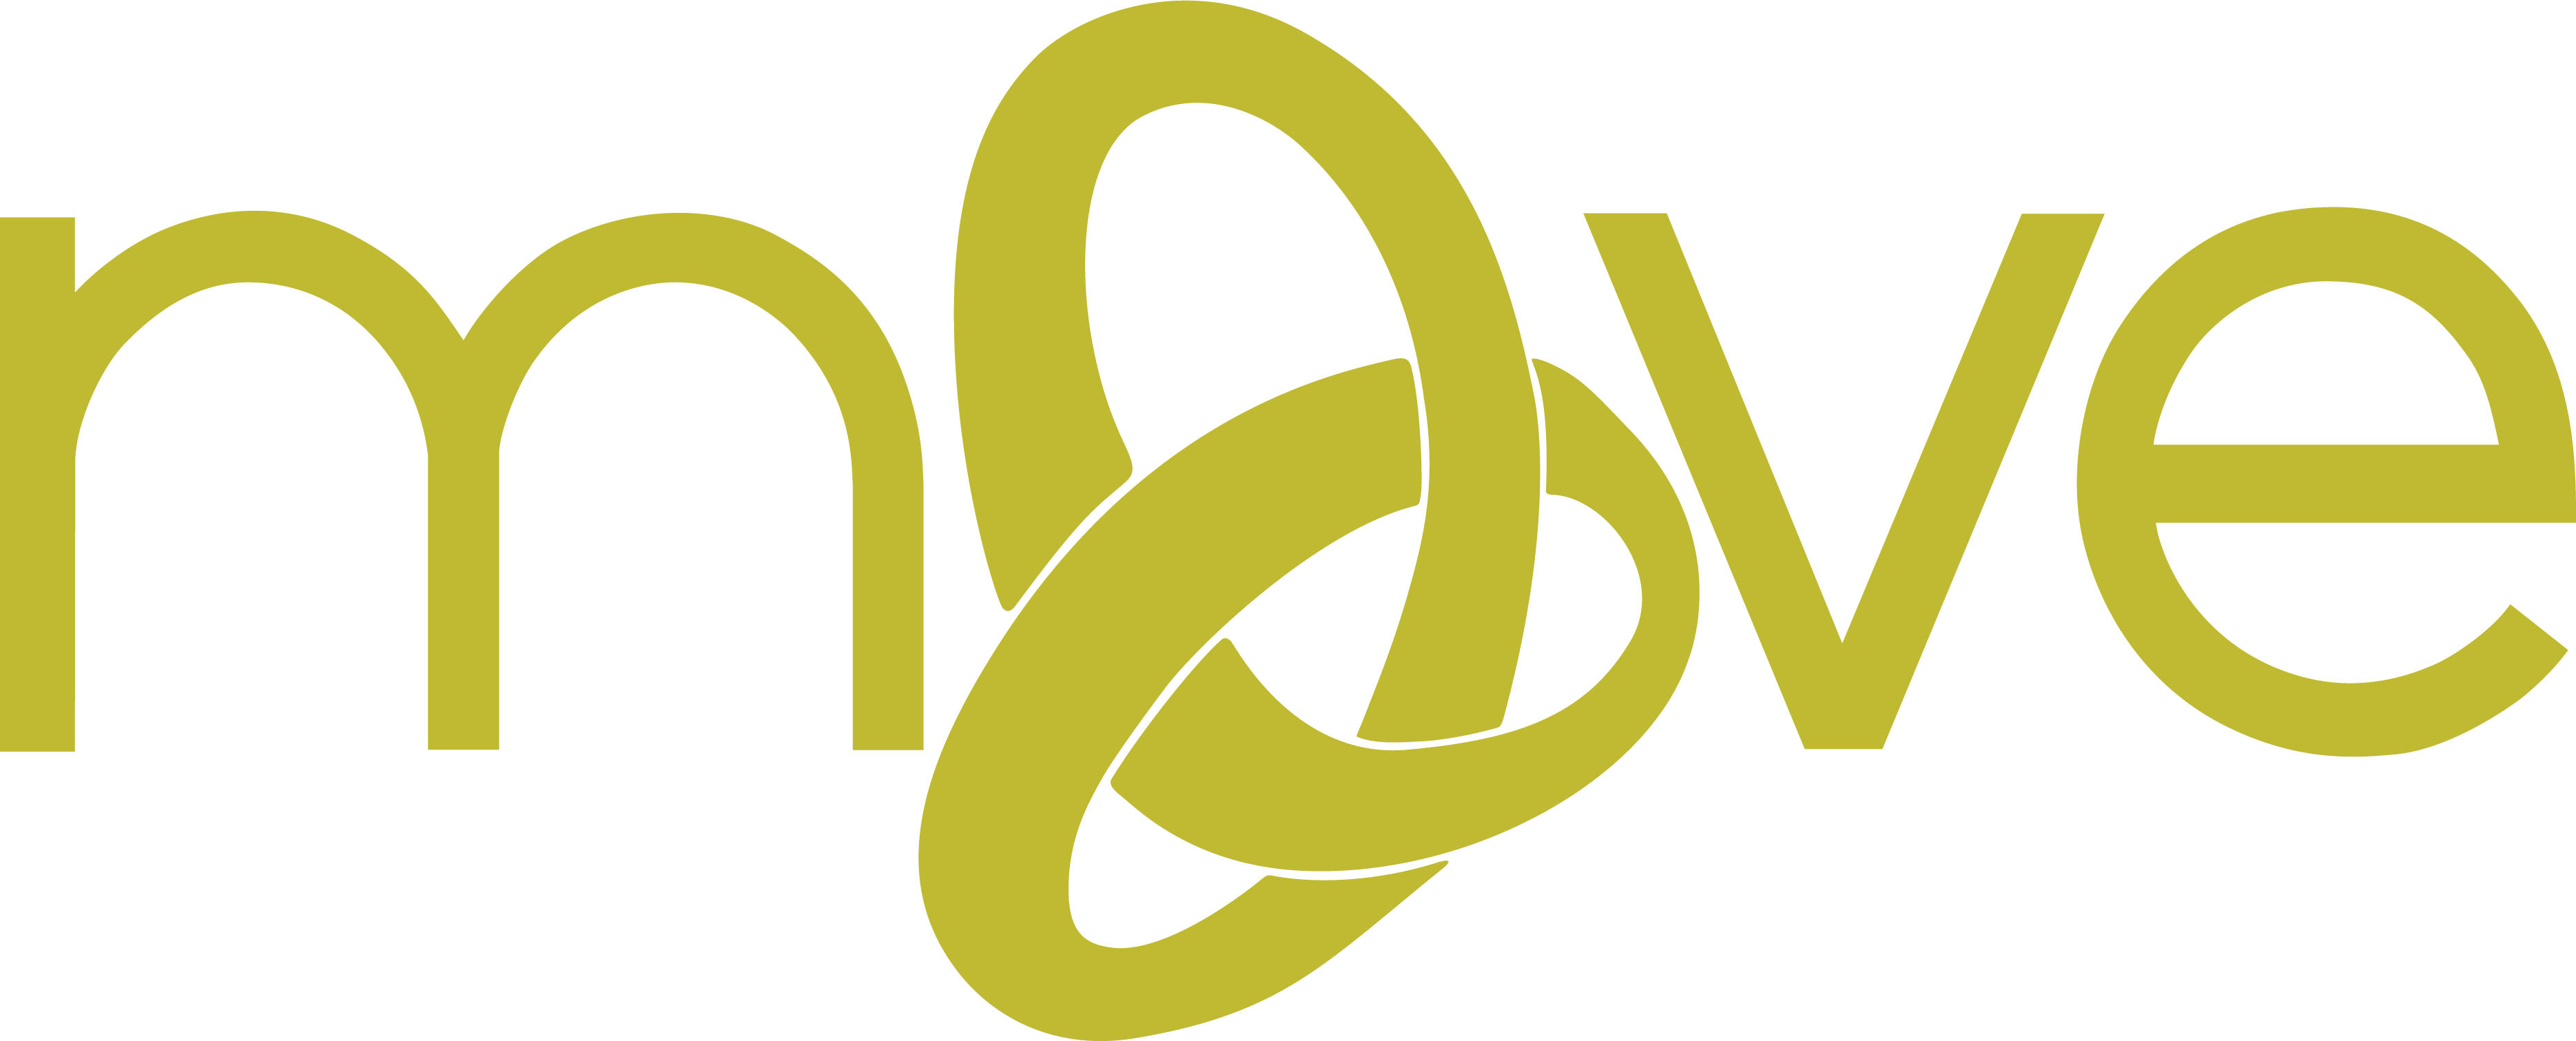 Ciy move logo